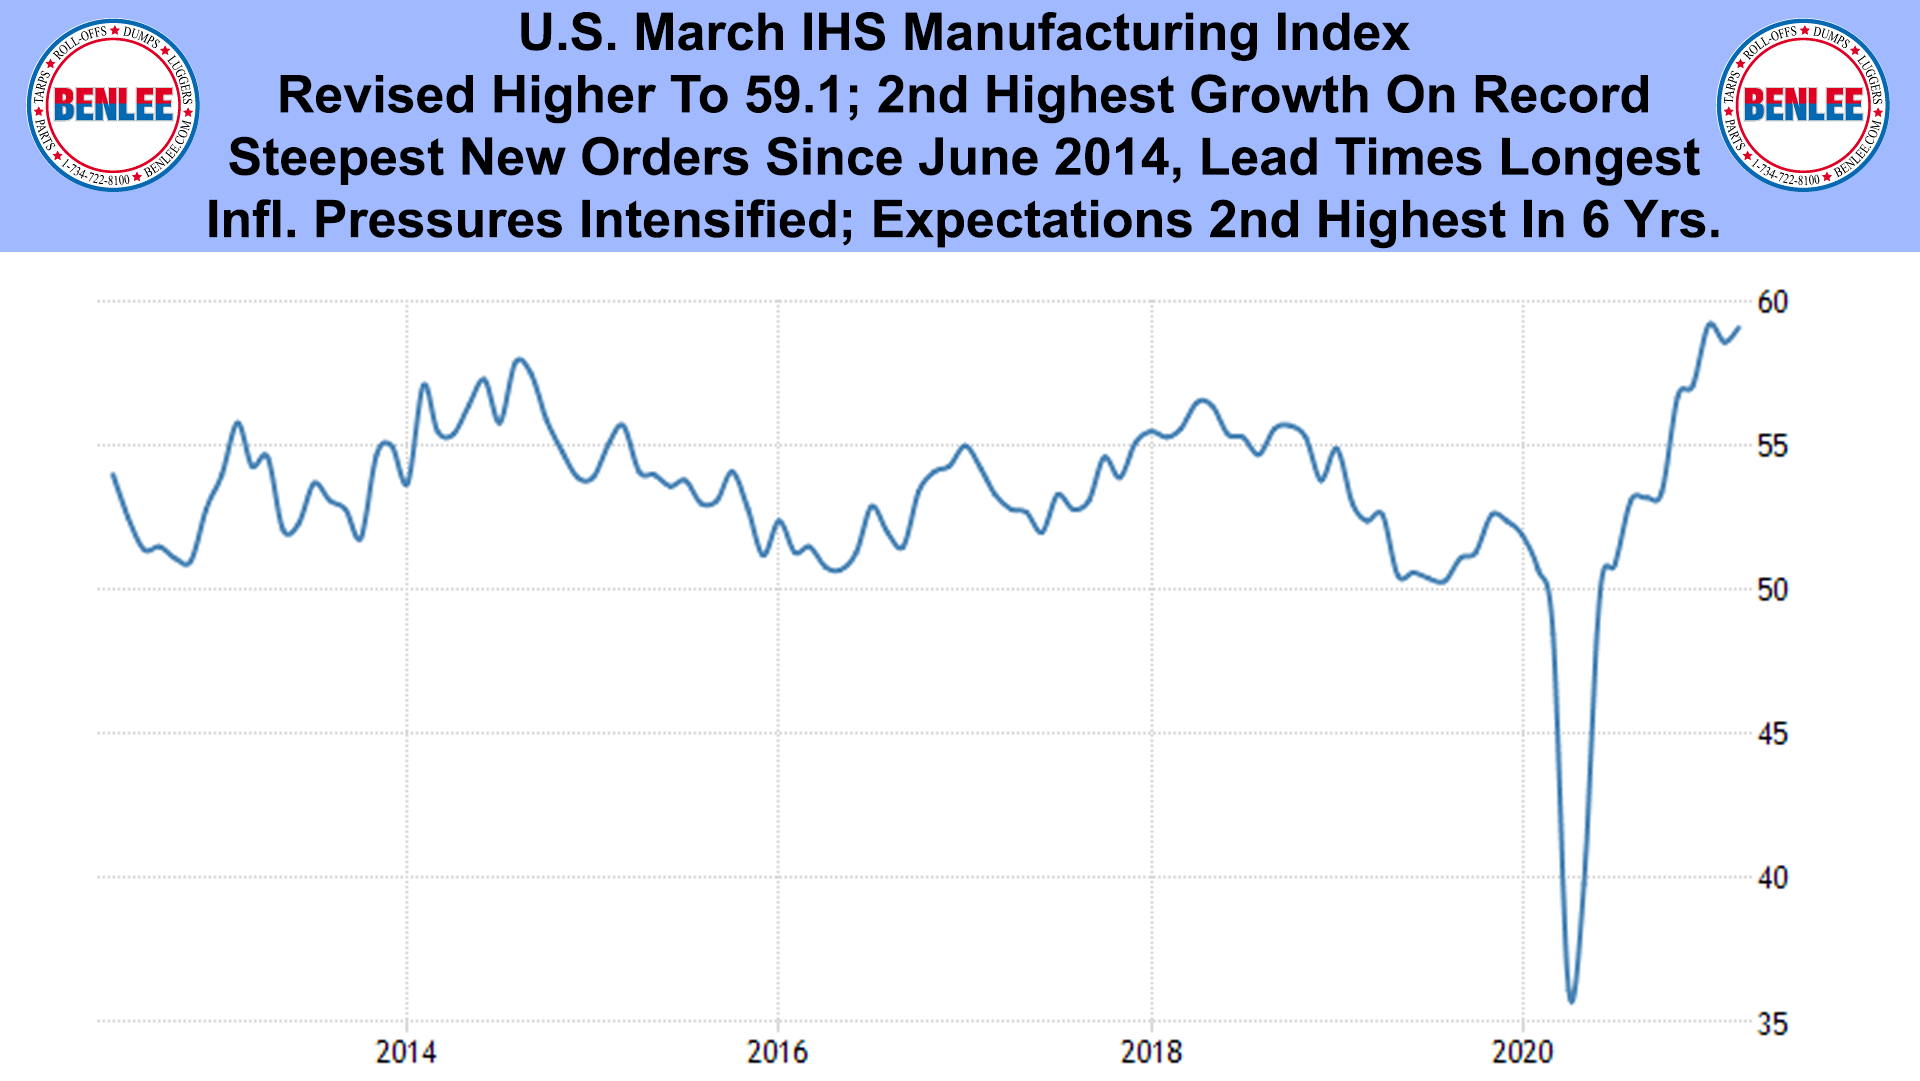 U.S. March IHS Manufacturing Index